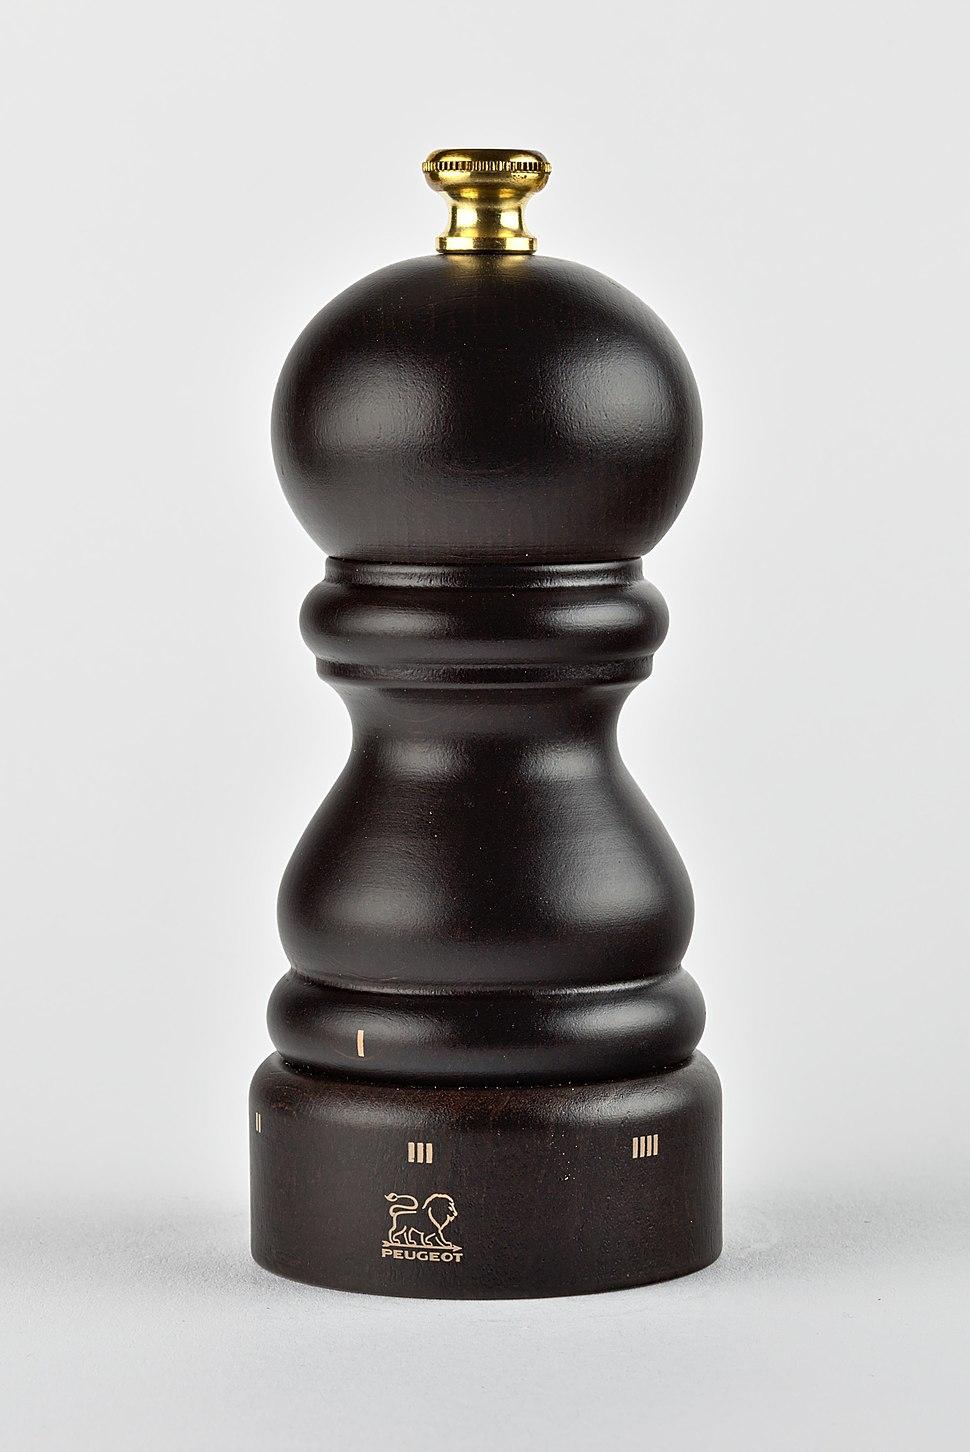 Peugeot pepper mill